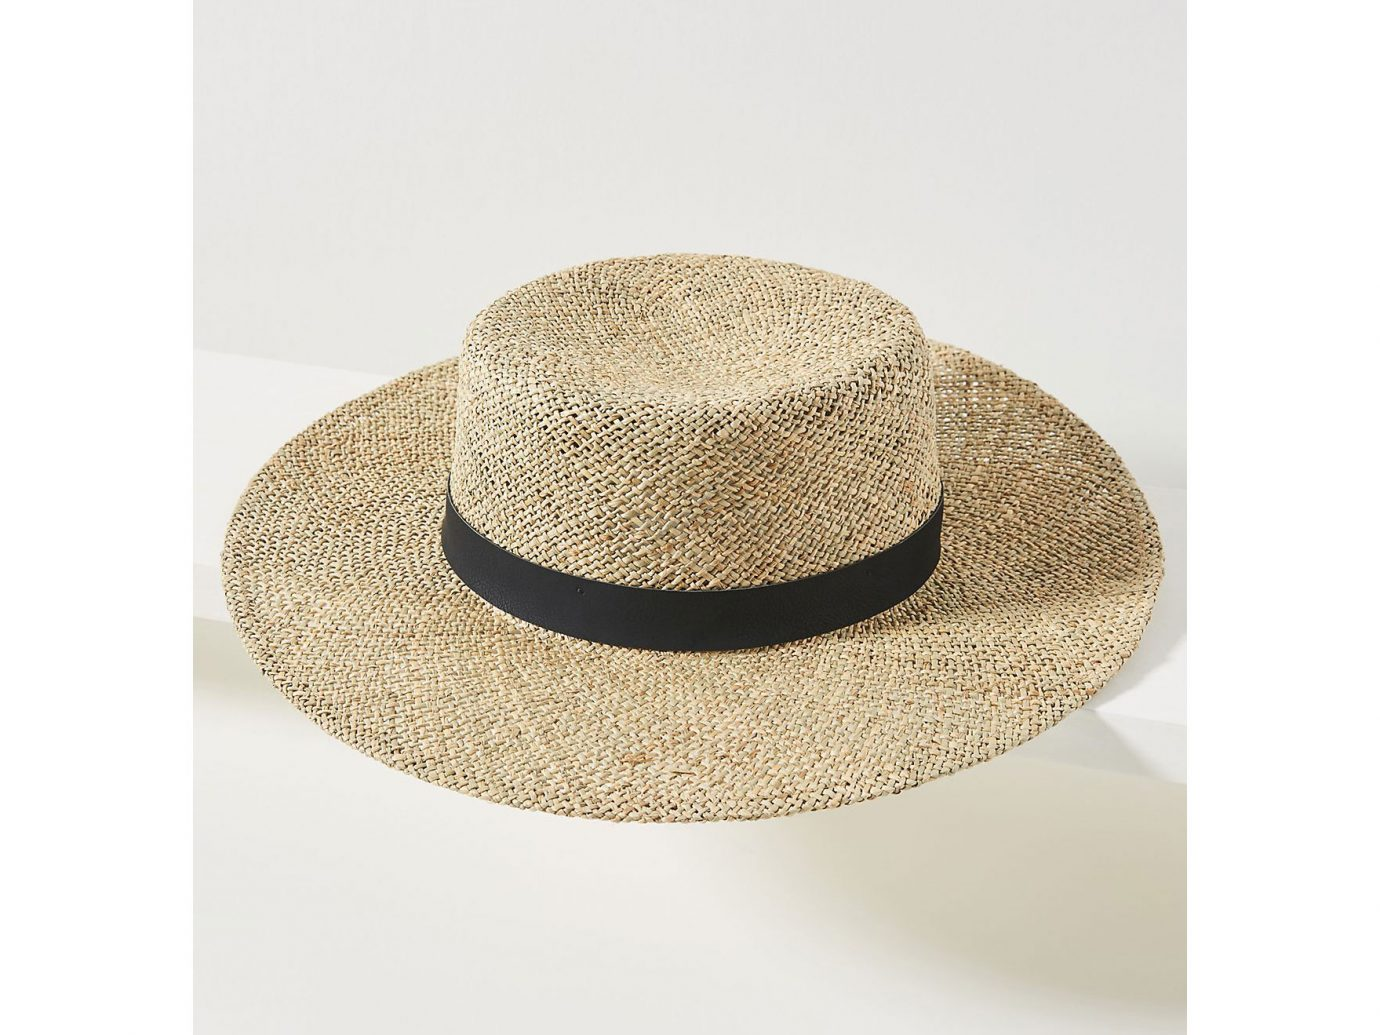 5e96aa8304 The 15 Best Sun Hats to Buy for Summer 2019 | Jetsetter